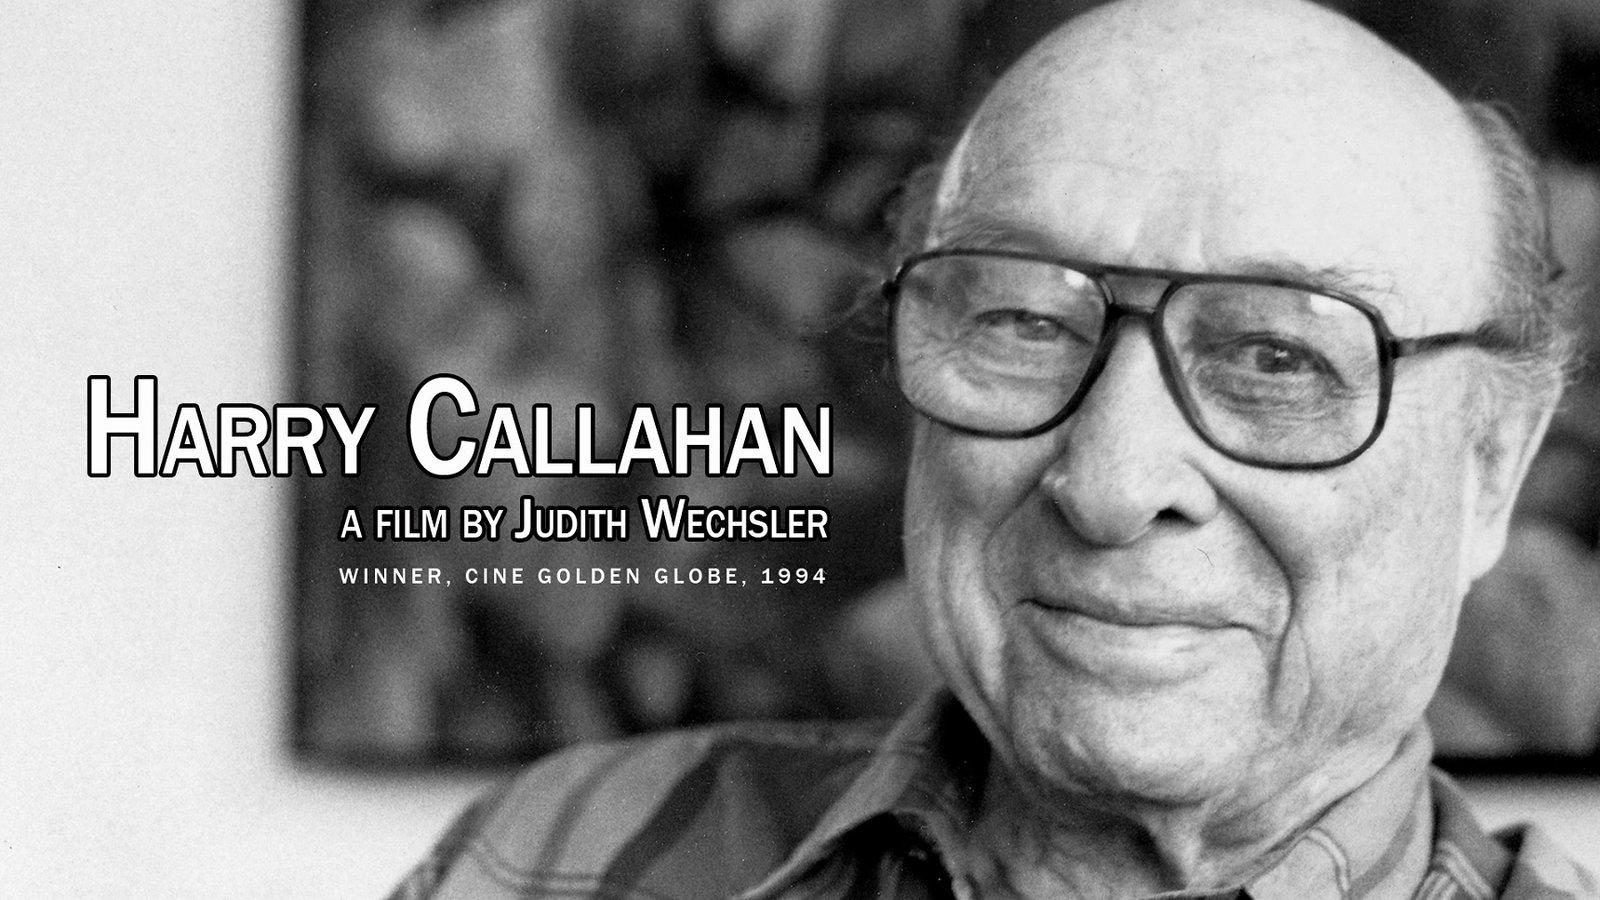 Harry Callahan - An American Photographer